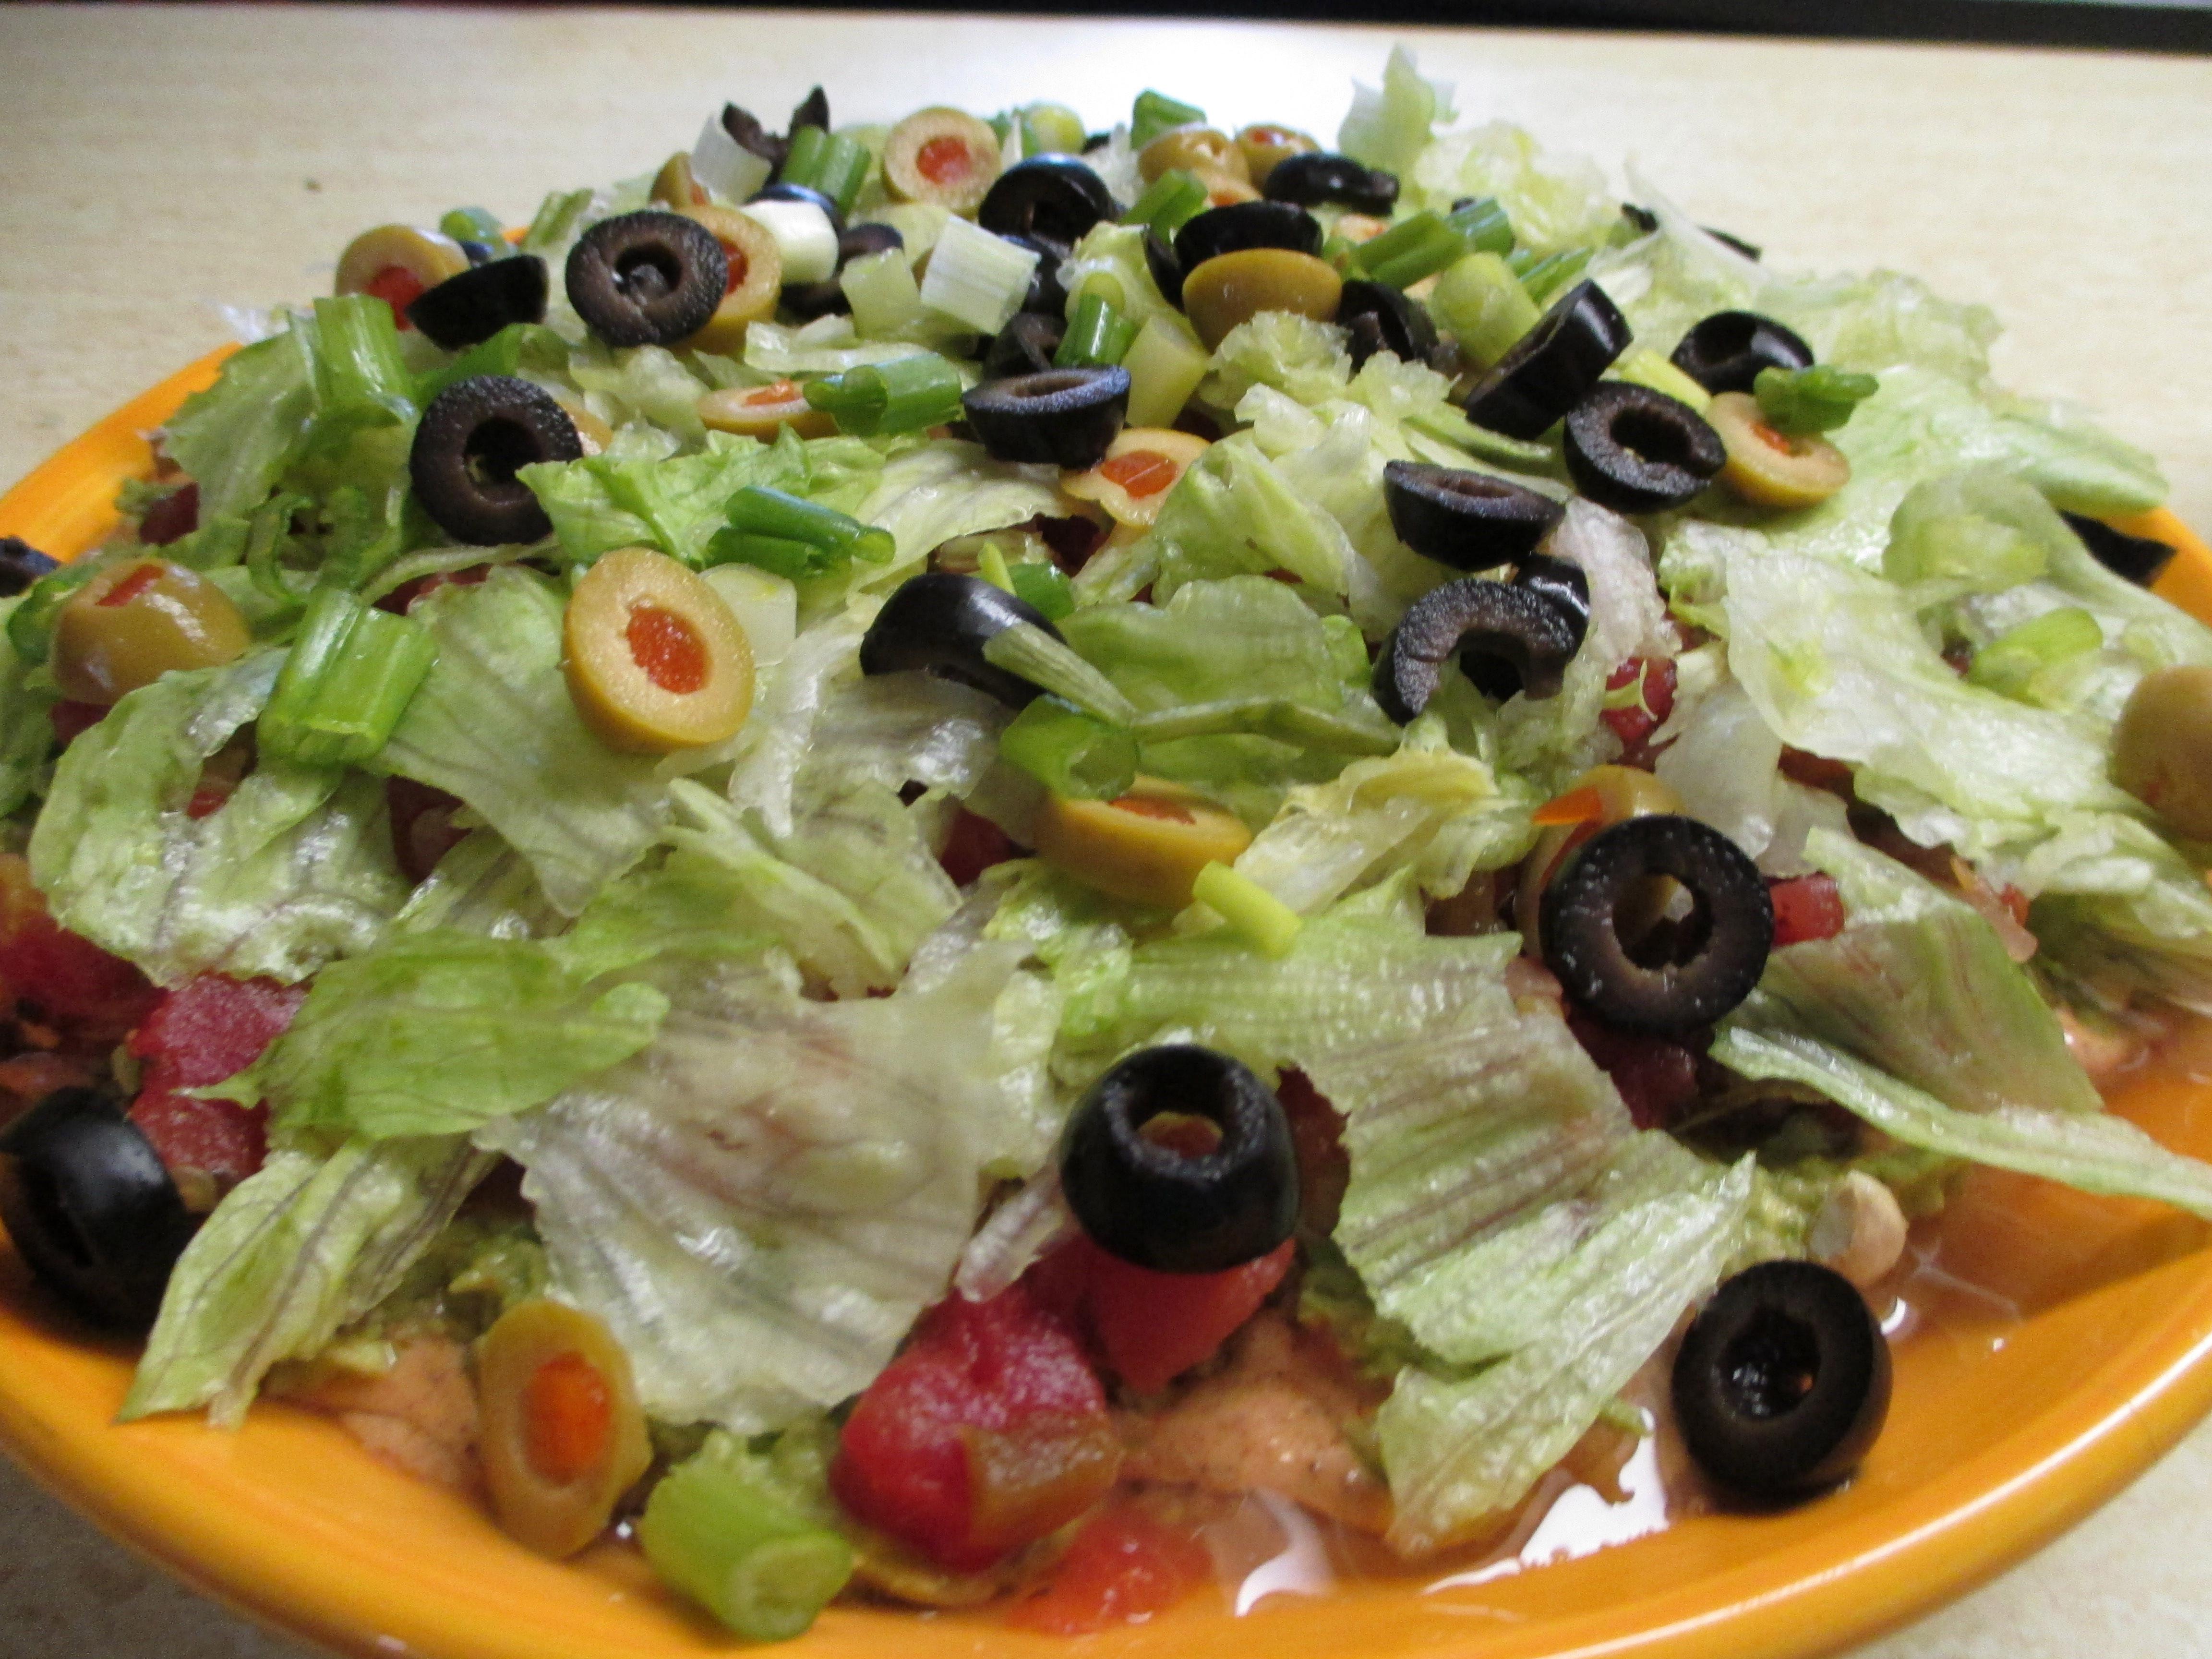 Vegan Bean Dip Recipes  Holiday Vegan 7 Layer Bean Dip – VegCharlotte